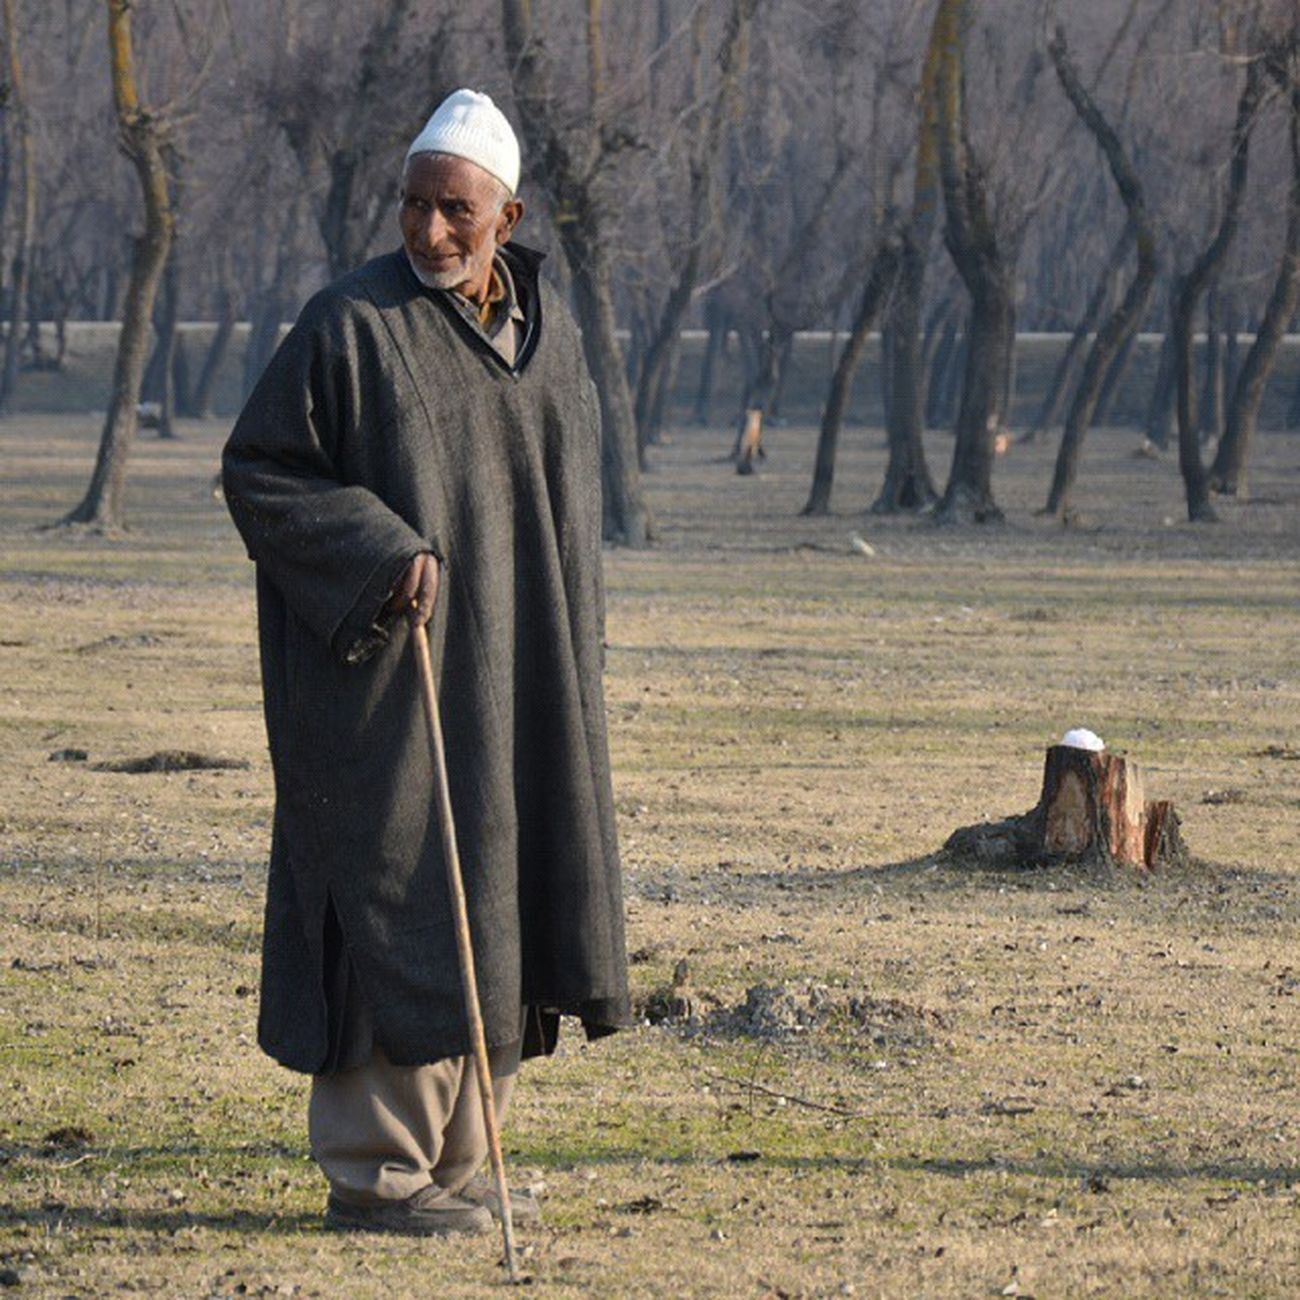 For Somethings Are So Important Kasheer Kashmir Pakistan Pakistani KashmirTalks Portrait PhiranClad Koshur Shepherd Woods Willows Revoshots IExploreKashmir IPhotographKashmir IAmKashmir Itravel IExplore Iphotograph IExploreMe Rebel Revo Freedom